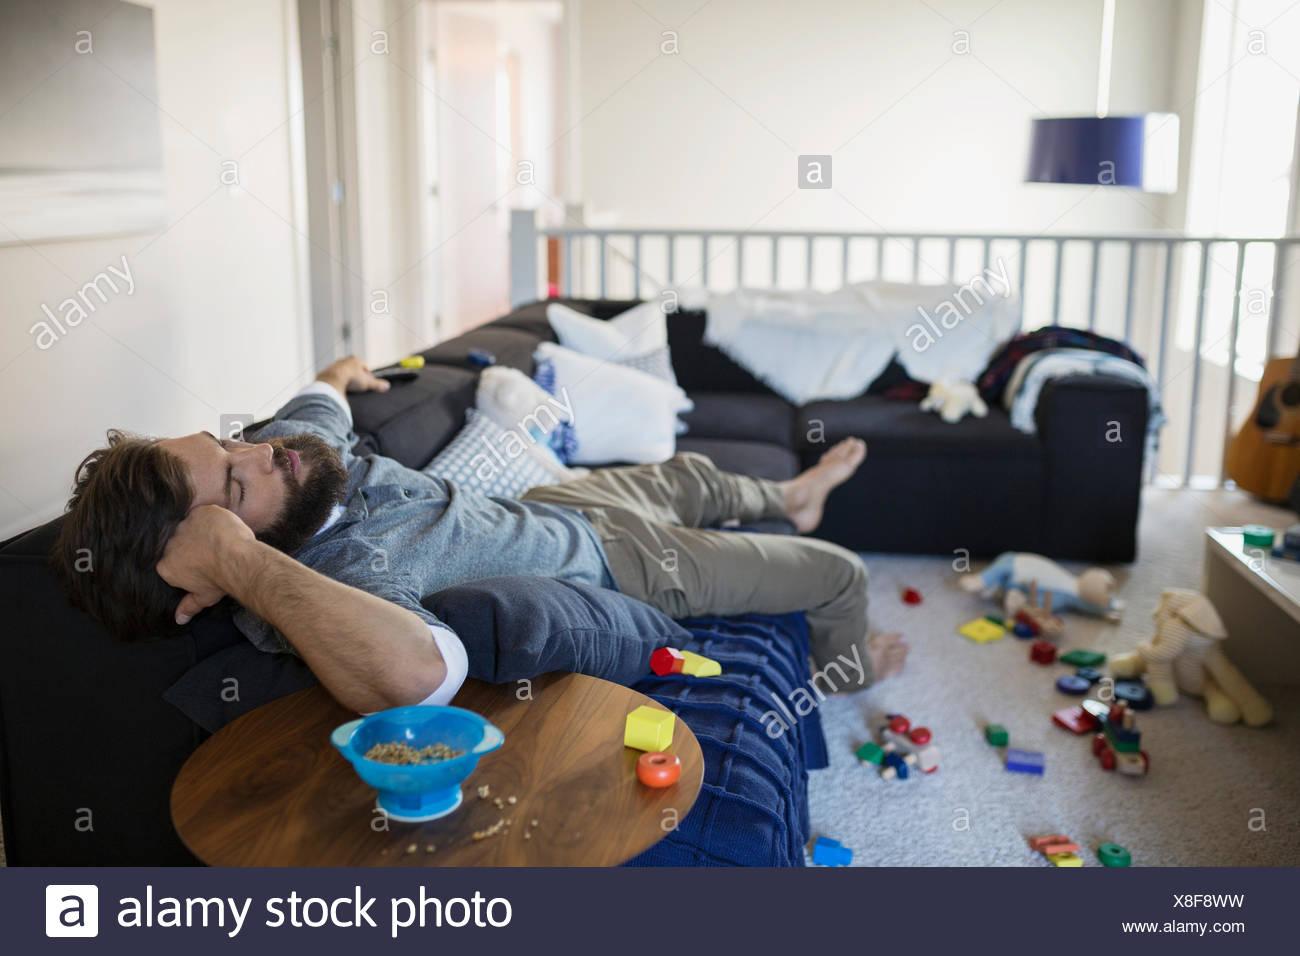 Agotado hombre dormitar en un sofá rodeado de juguetes Imagen De Stock